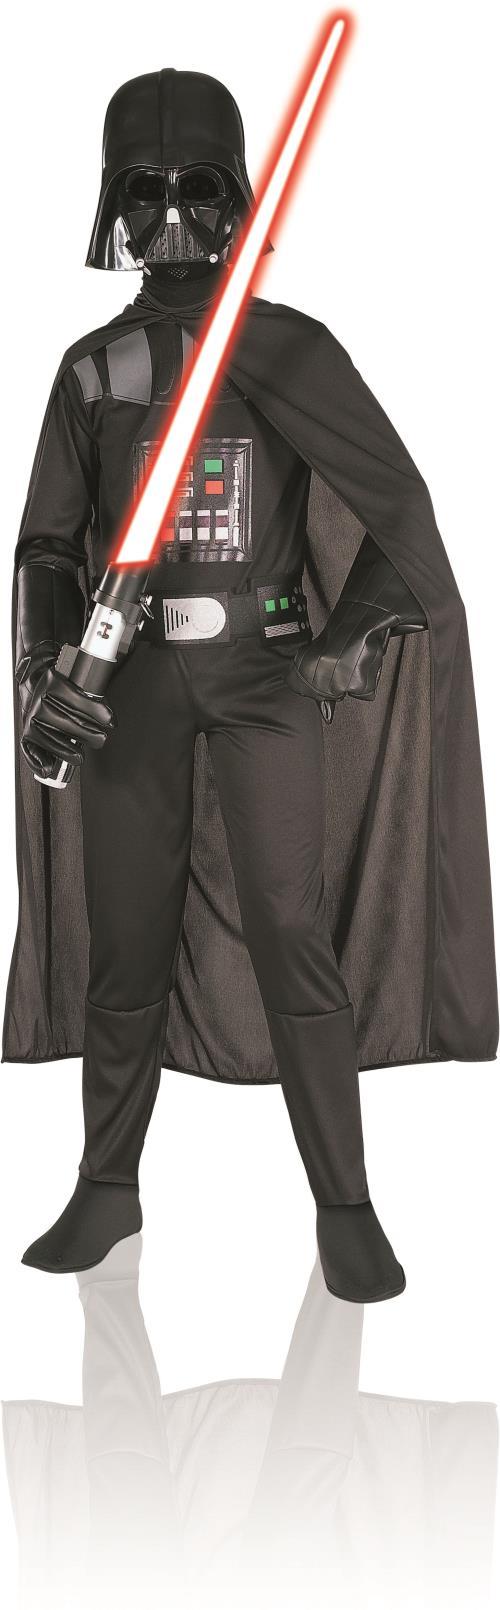 Déguisement Dark Vador Star Wars Taille M 5/7 ans